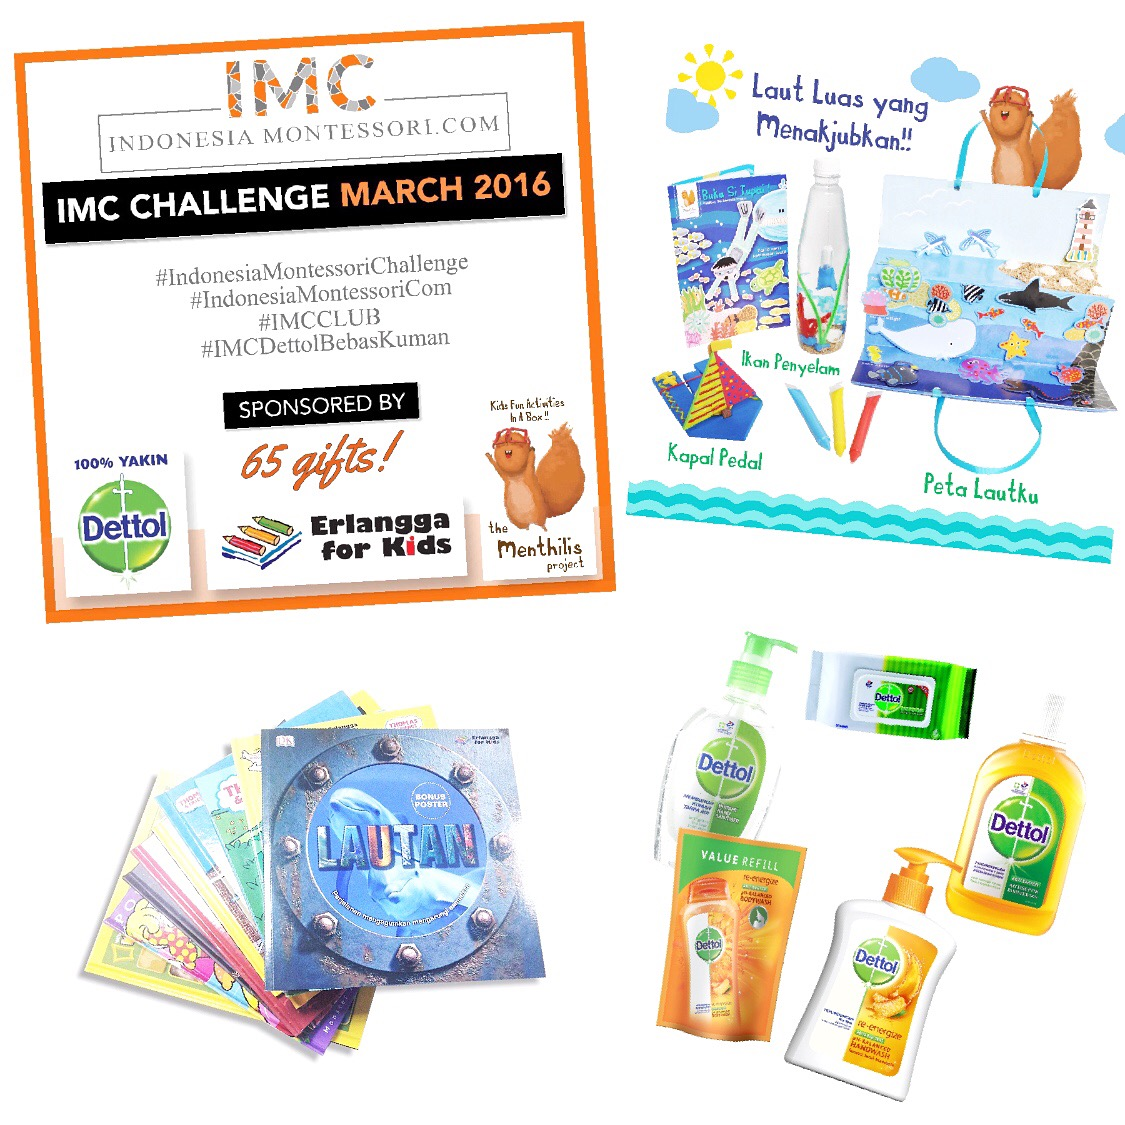 indonesia montessori challenge sponsor